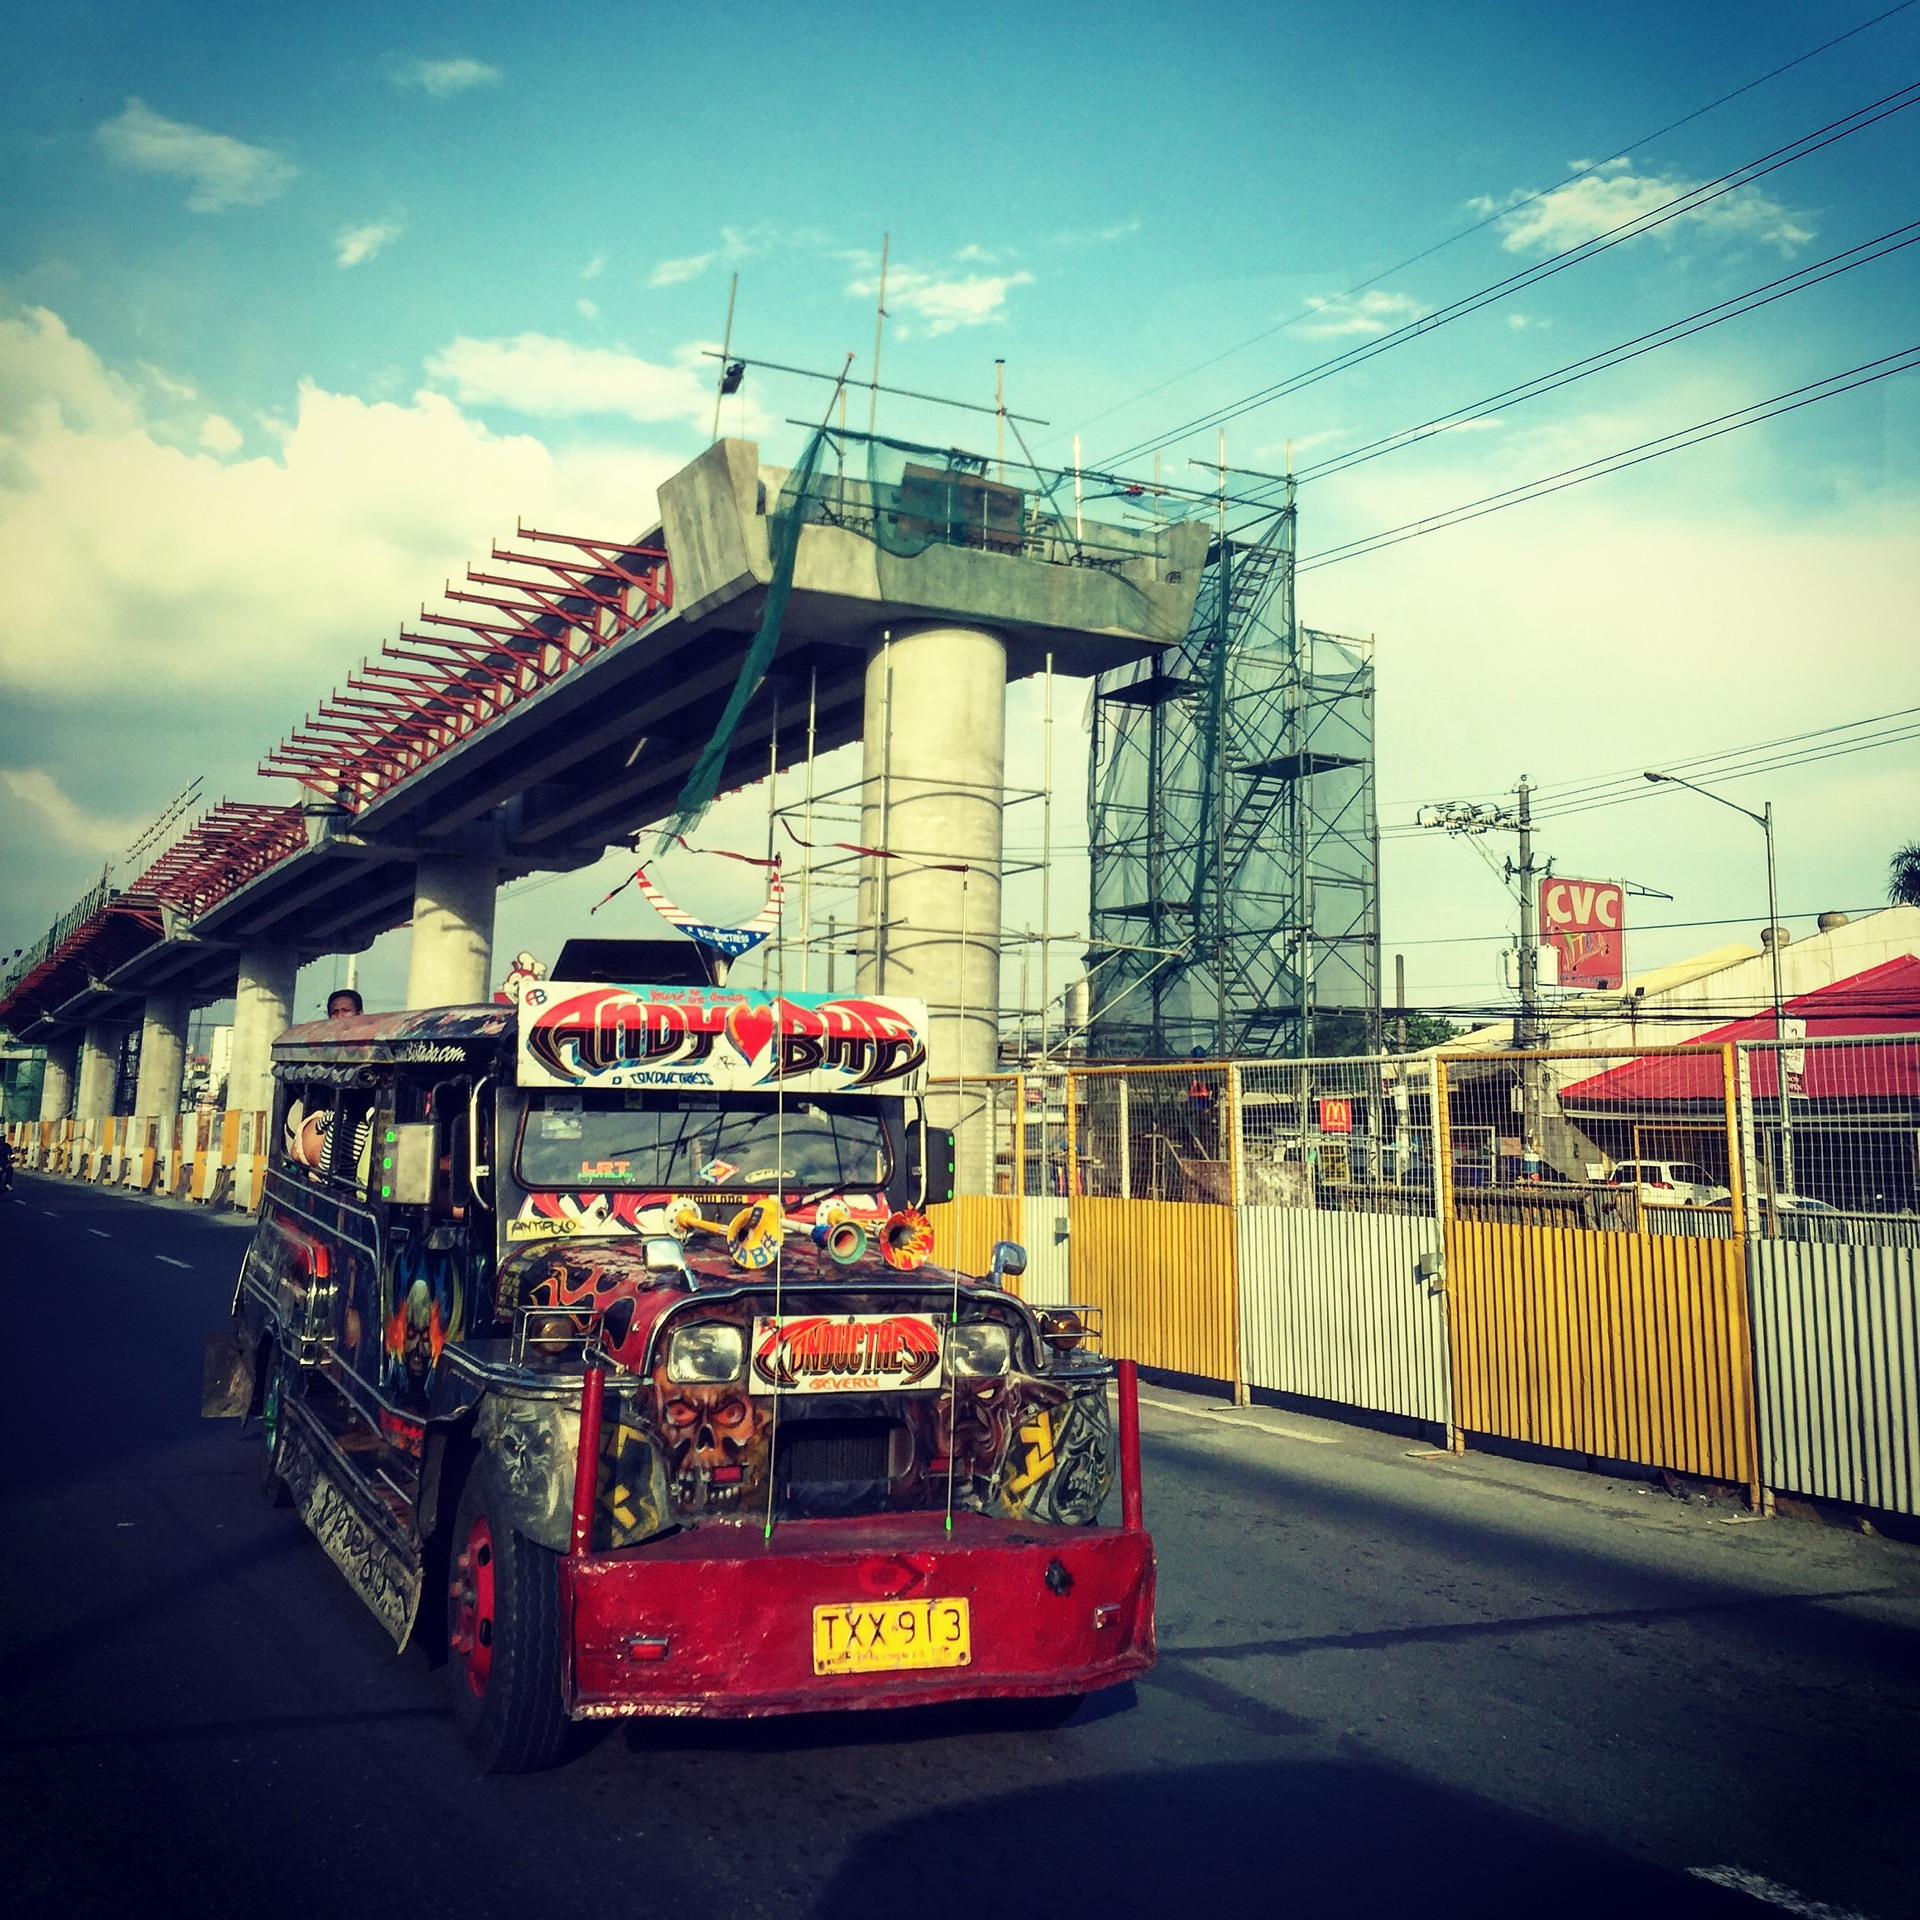 jeepney-1651141_1920